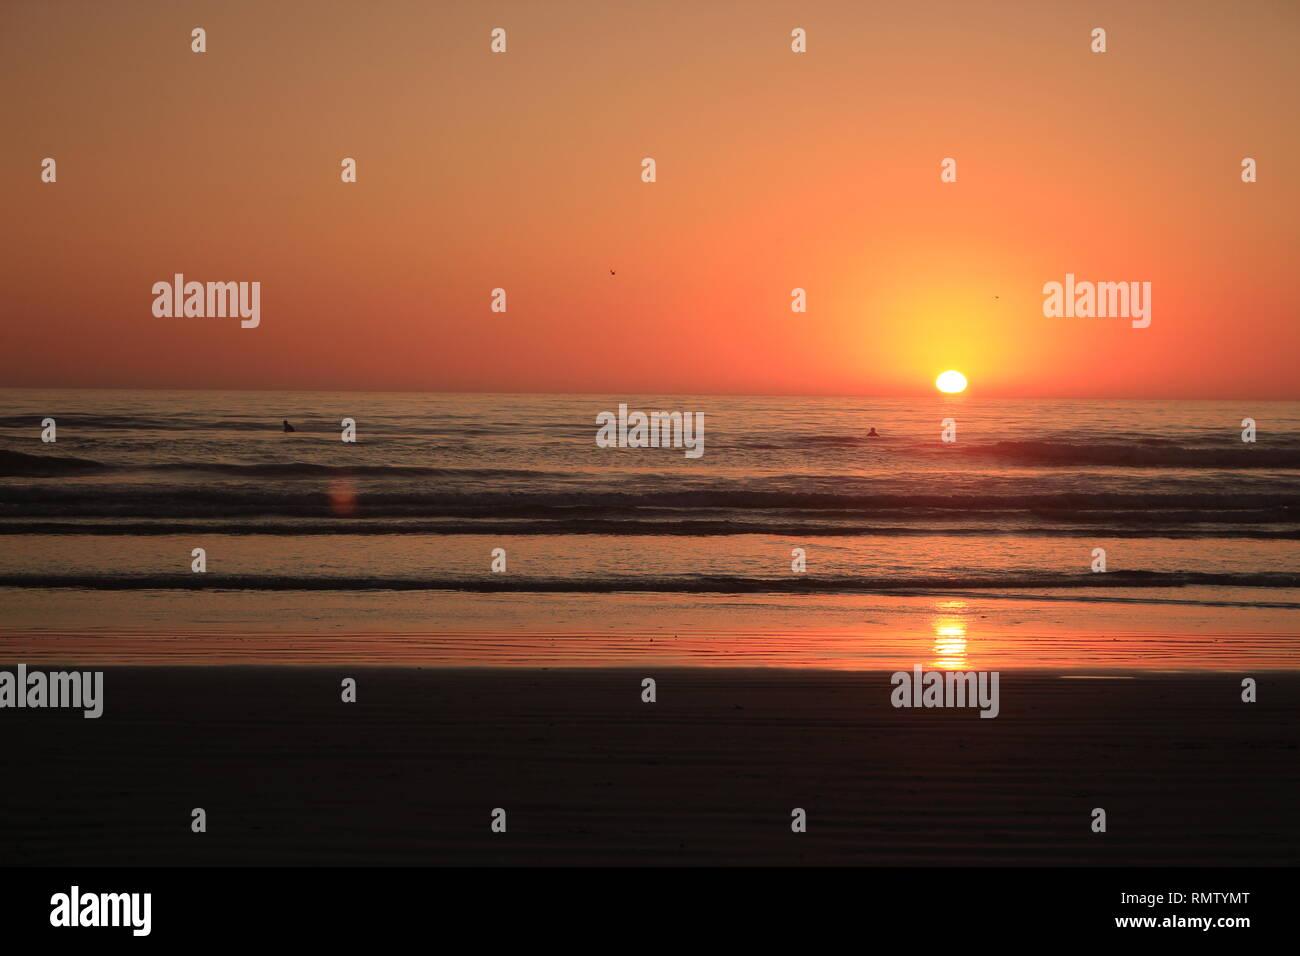 Sonnenuntergang am Strand - Stock Image